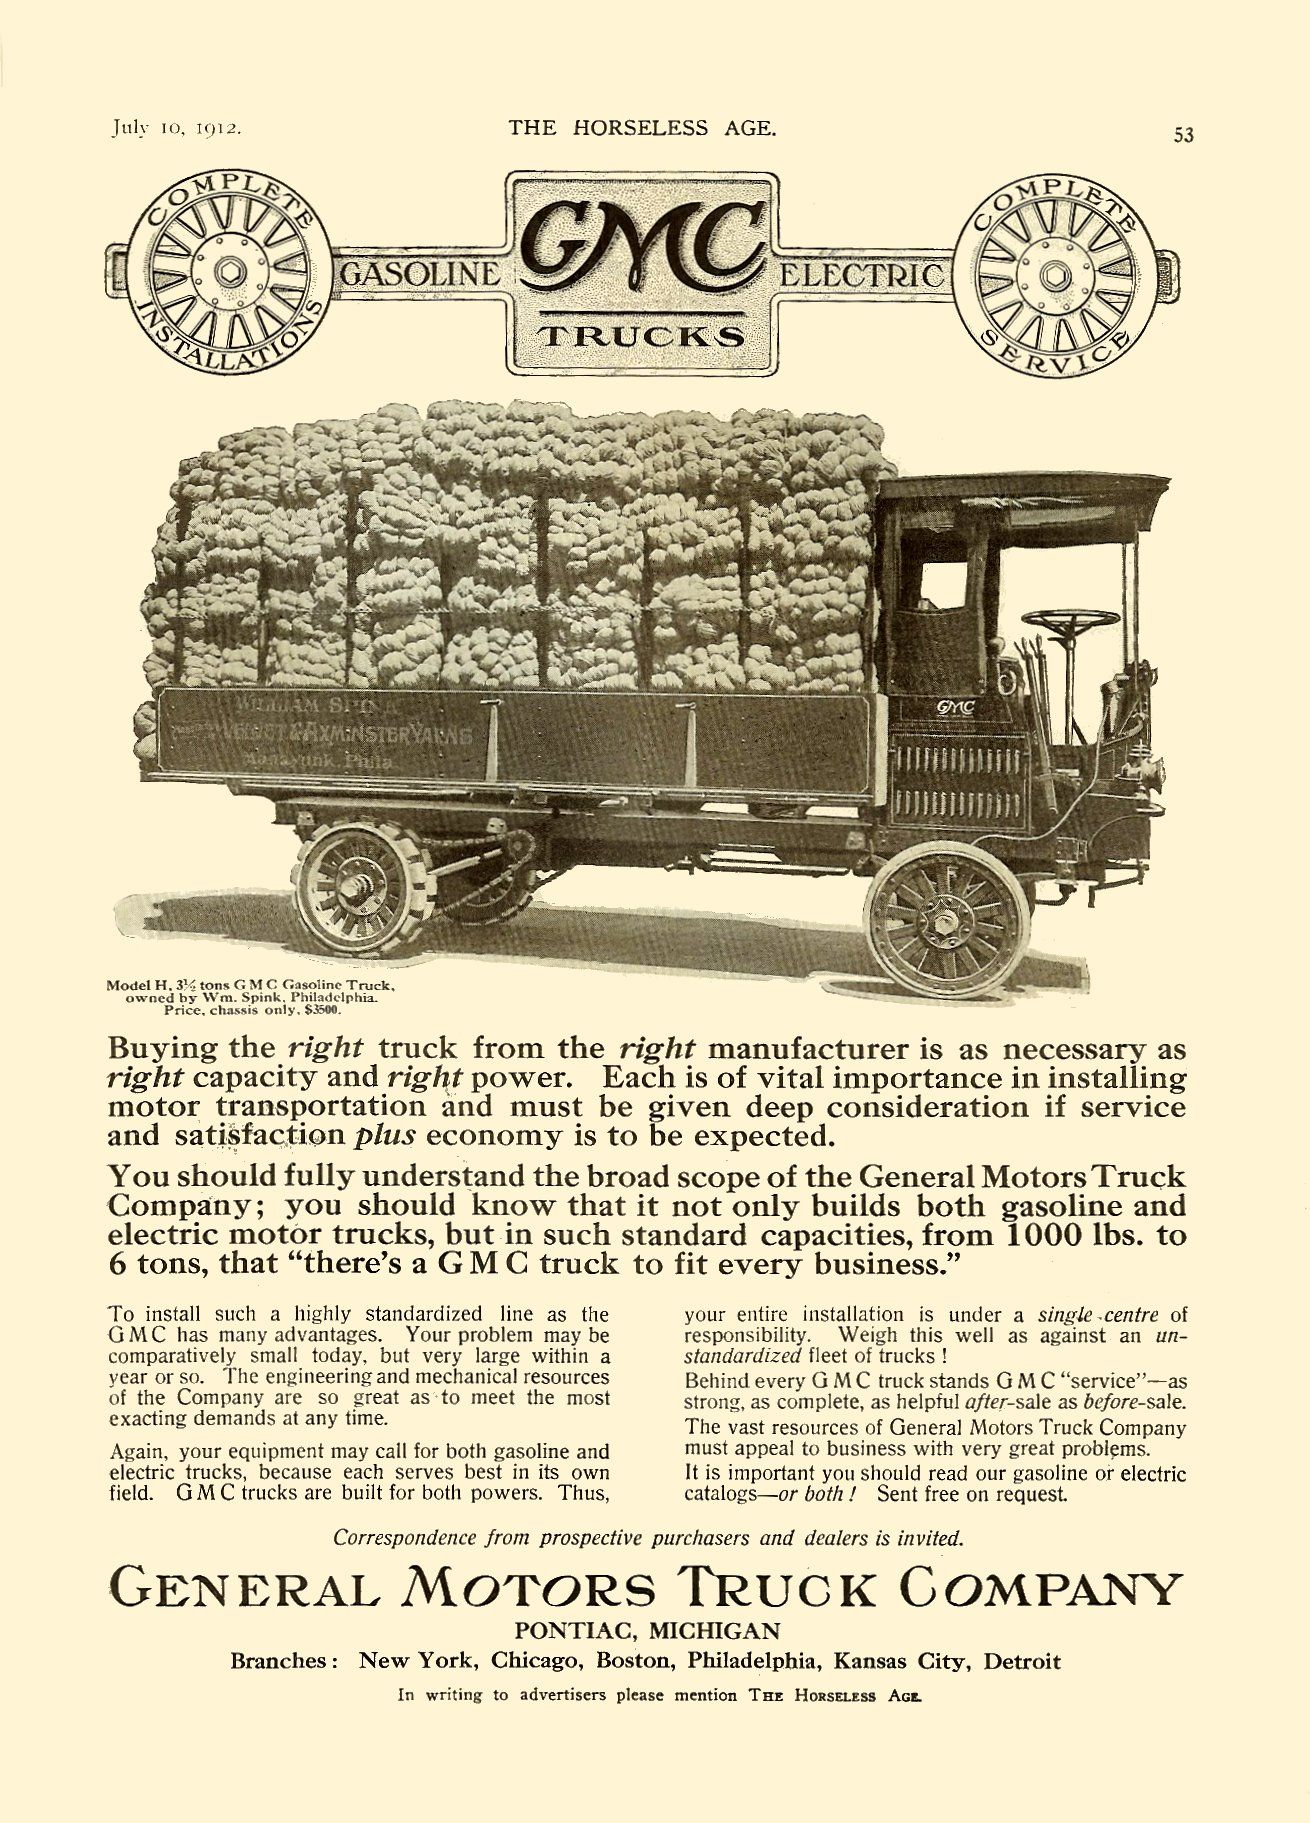 1912 Gasoline Gmc Trucks Electric General Motors Truck